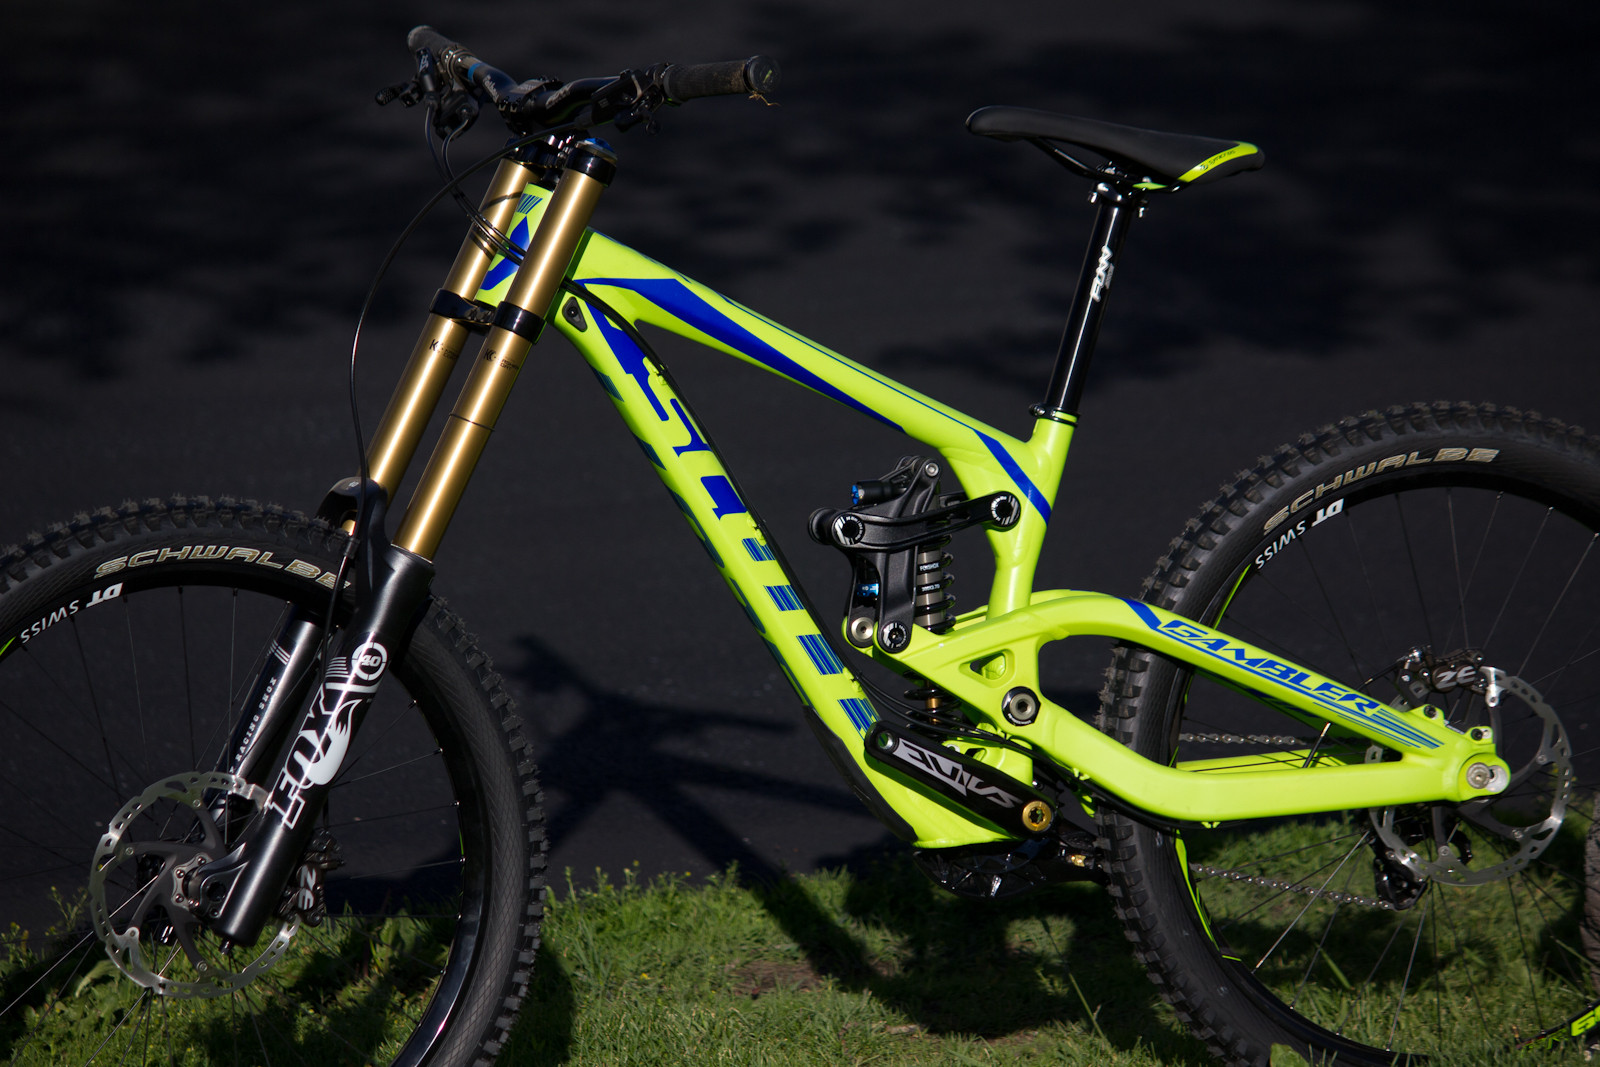 2013 Scott Gambler 10 - Lighter Than Ever - First Look: 2013 Scott Gambler 10 - Ready For Production - Mountain Biking Pictures - Vital MTB